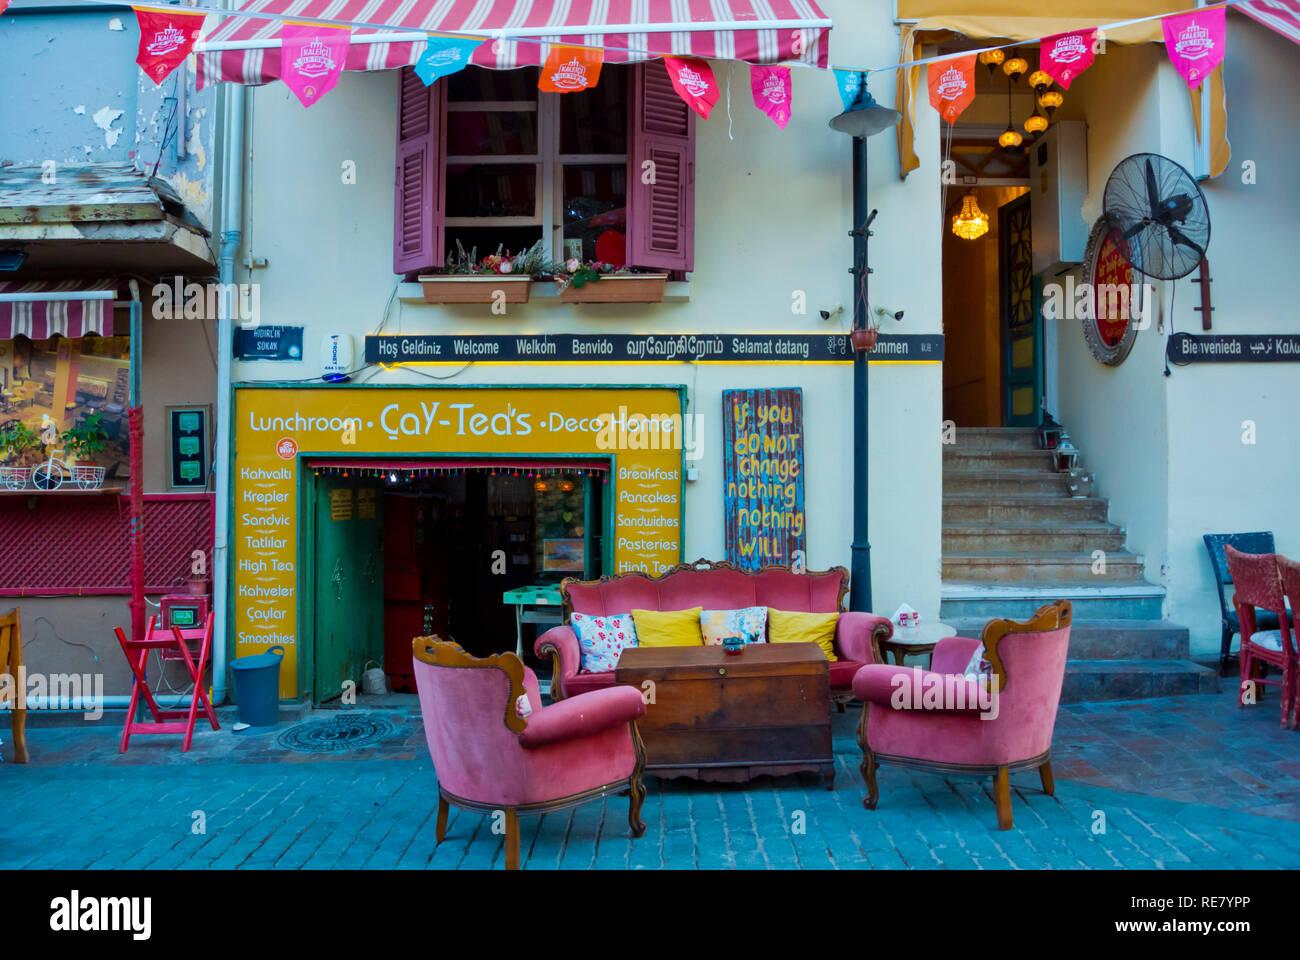 Cafe tearoom terrace, Kaleici, old town, Antalya, Turkey, Eurasia - Stock Image